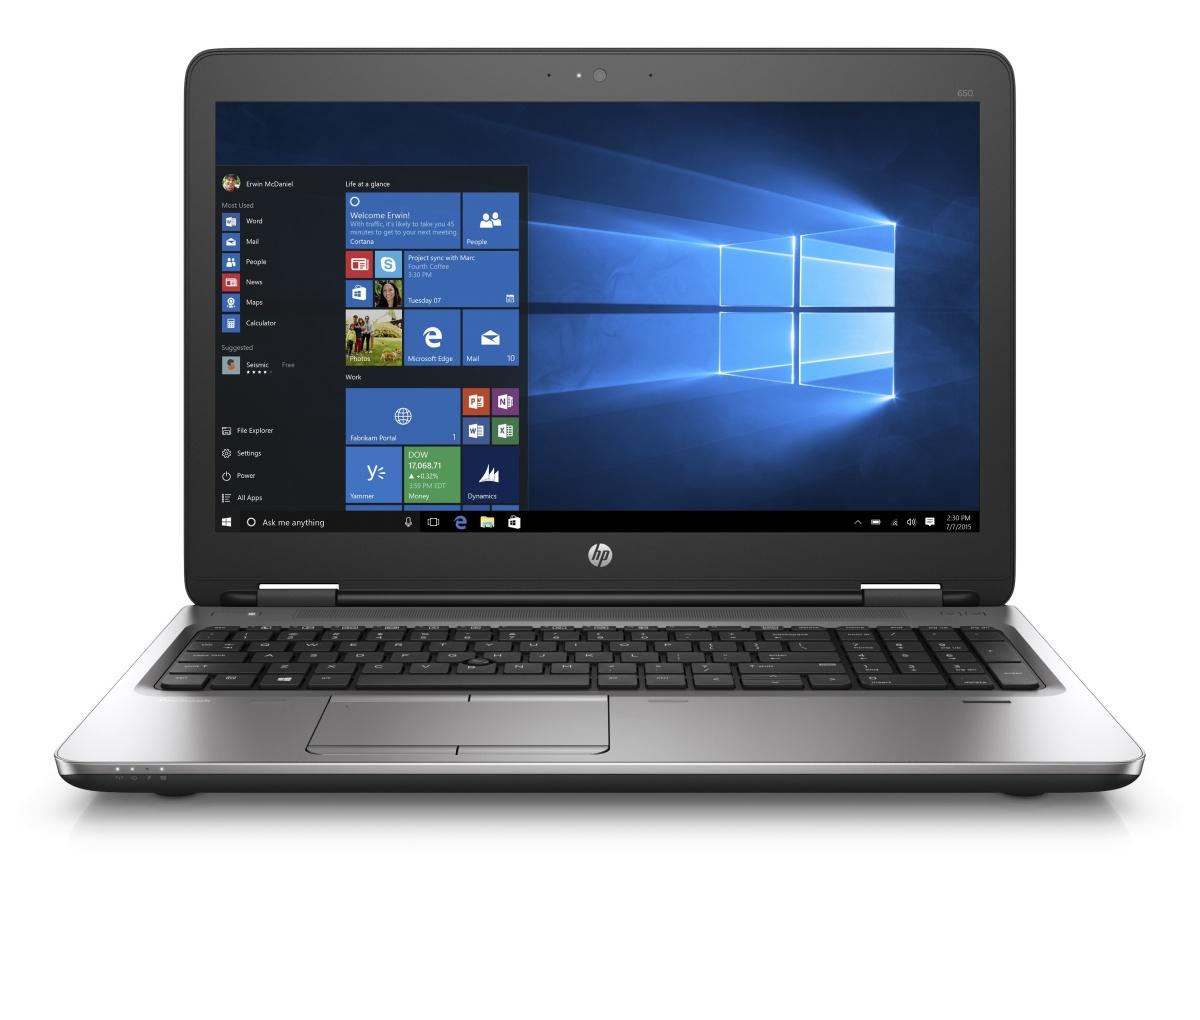 "HP ProBook 650 G2 15.6"" FHD/i5-6200U/4GB/256SSD/DVD/VGA/DP/SP/RJ45/WIFI/BT/MCR/FPR/1RServis/7+10P"